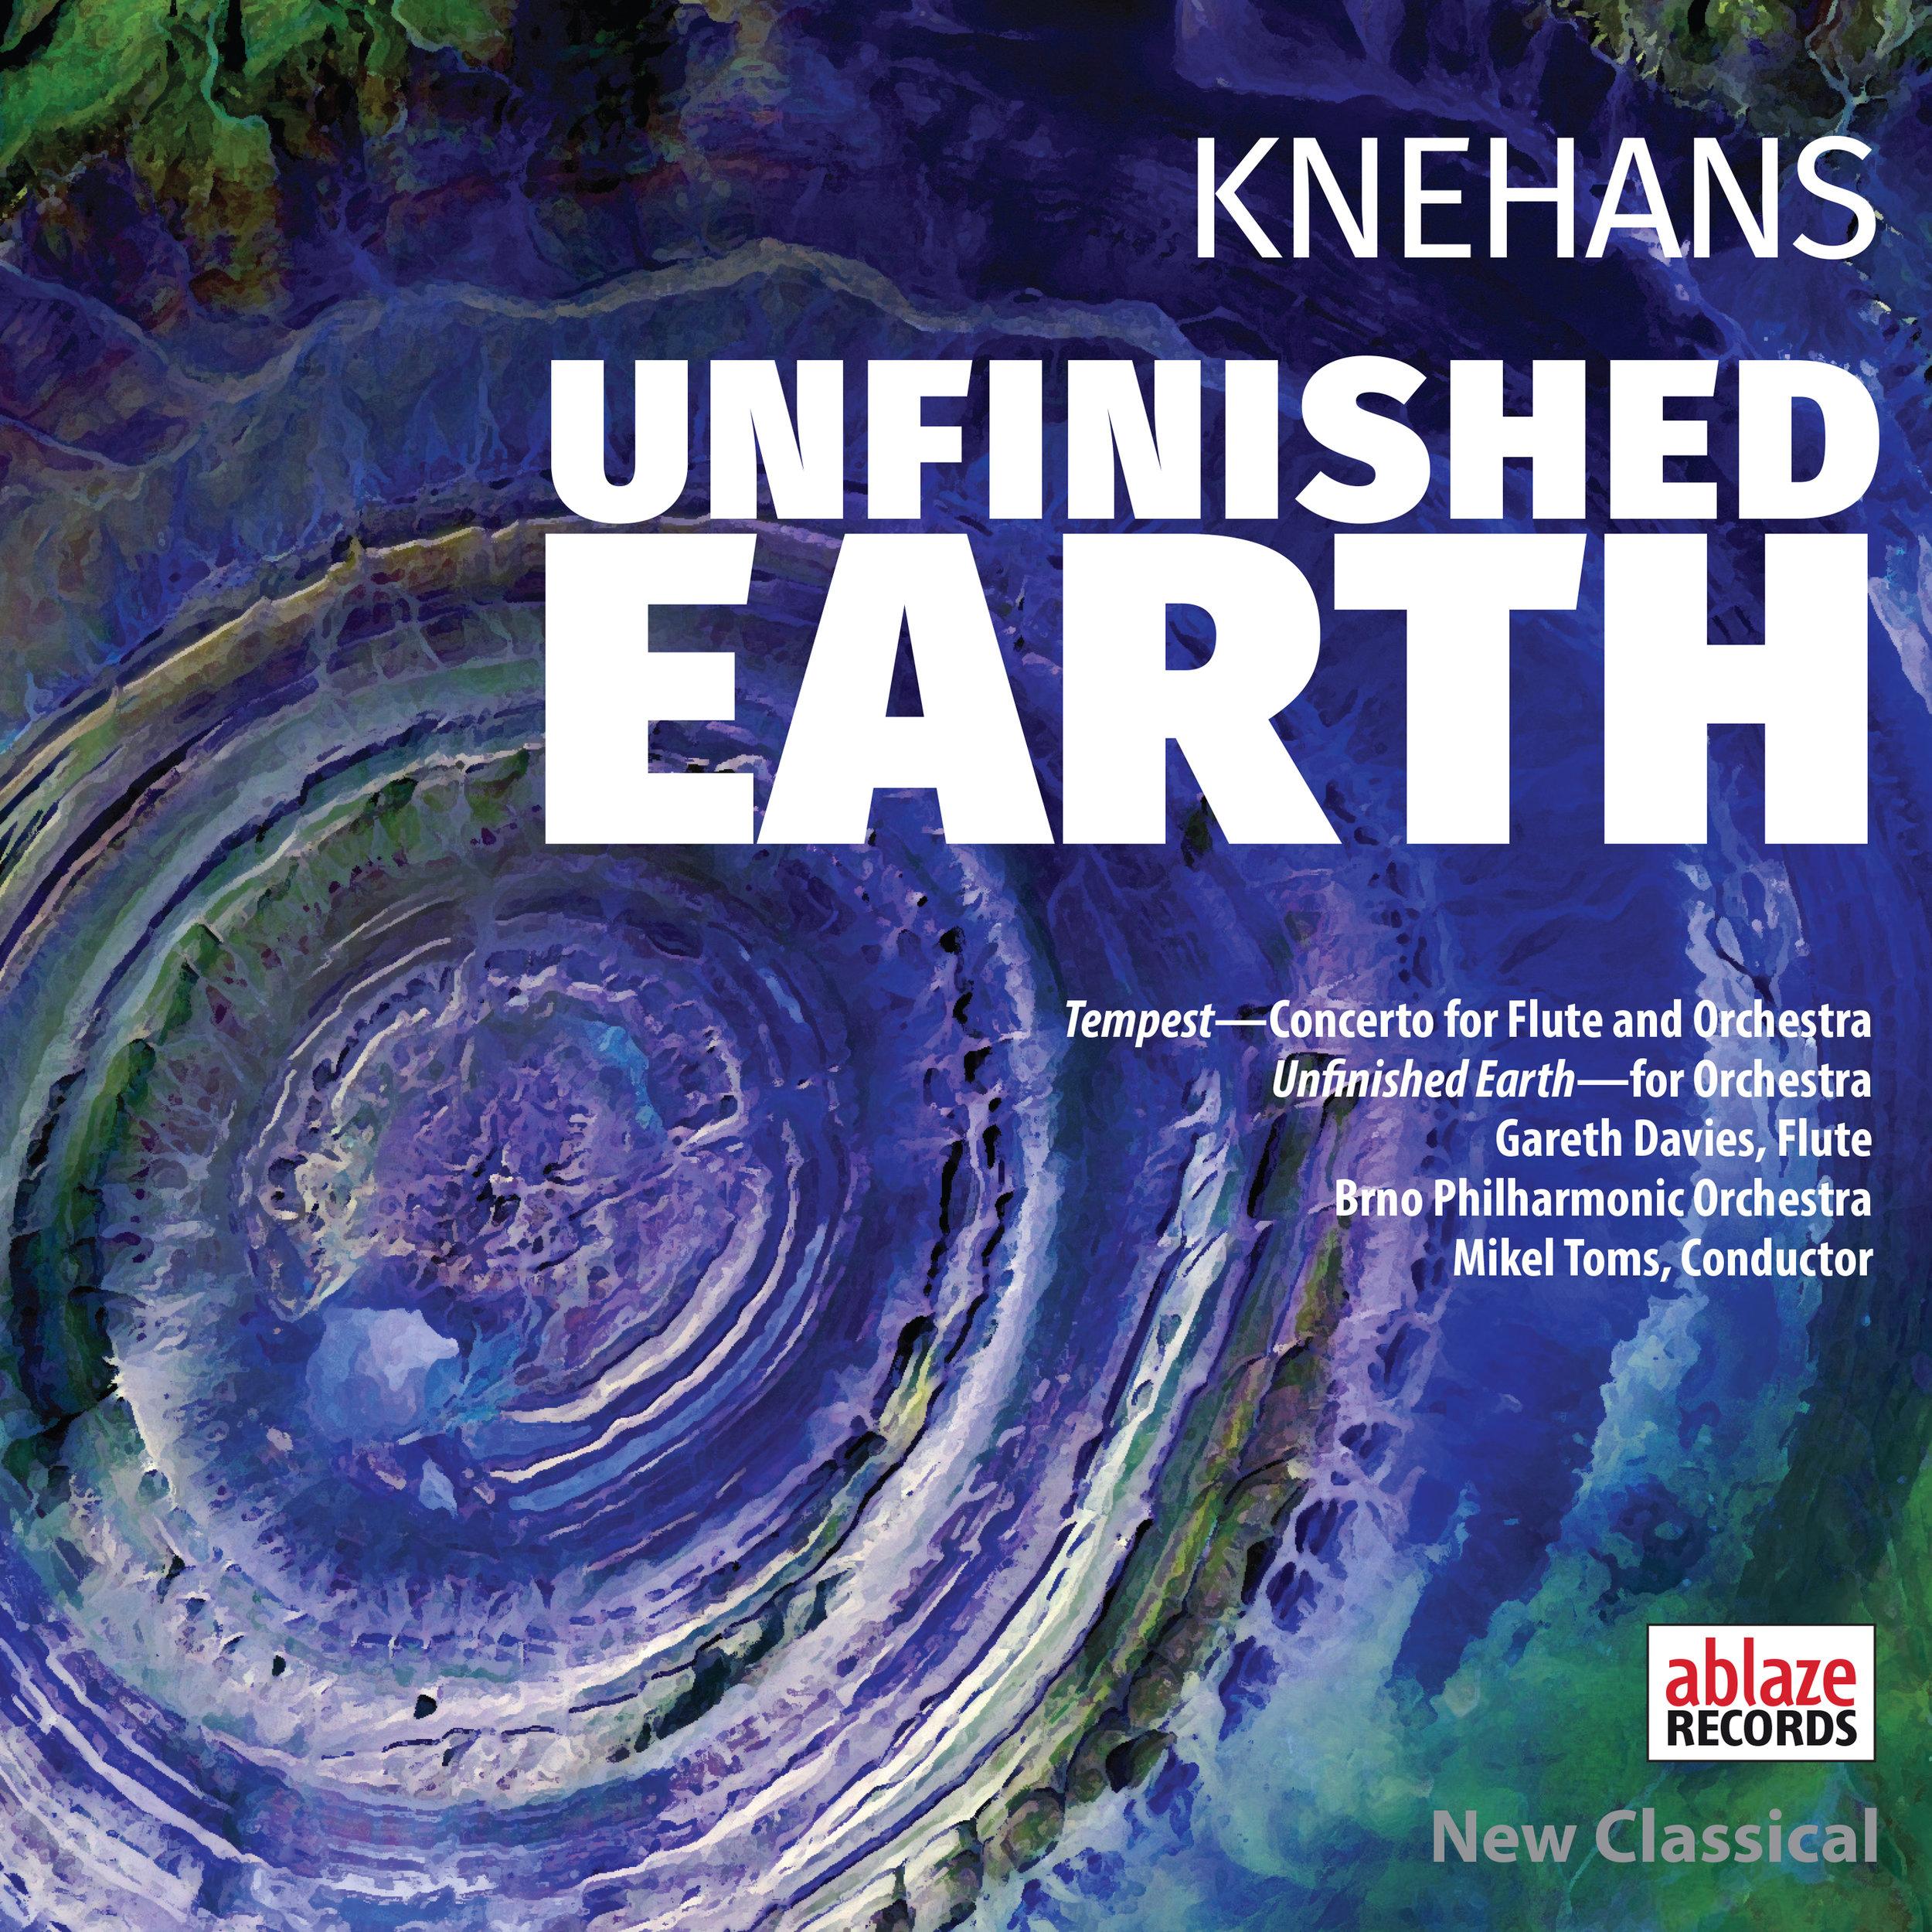 Cover_Douglas_Knehans_Unfinished_Earth_300dpi_3000pix.jpg